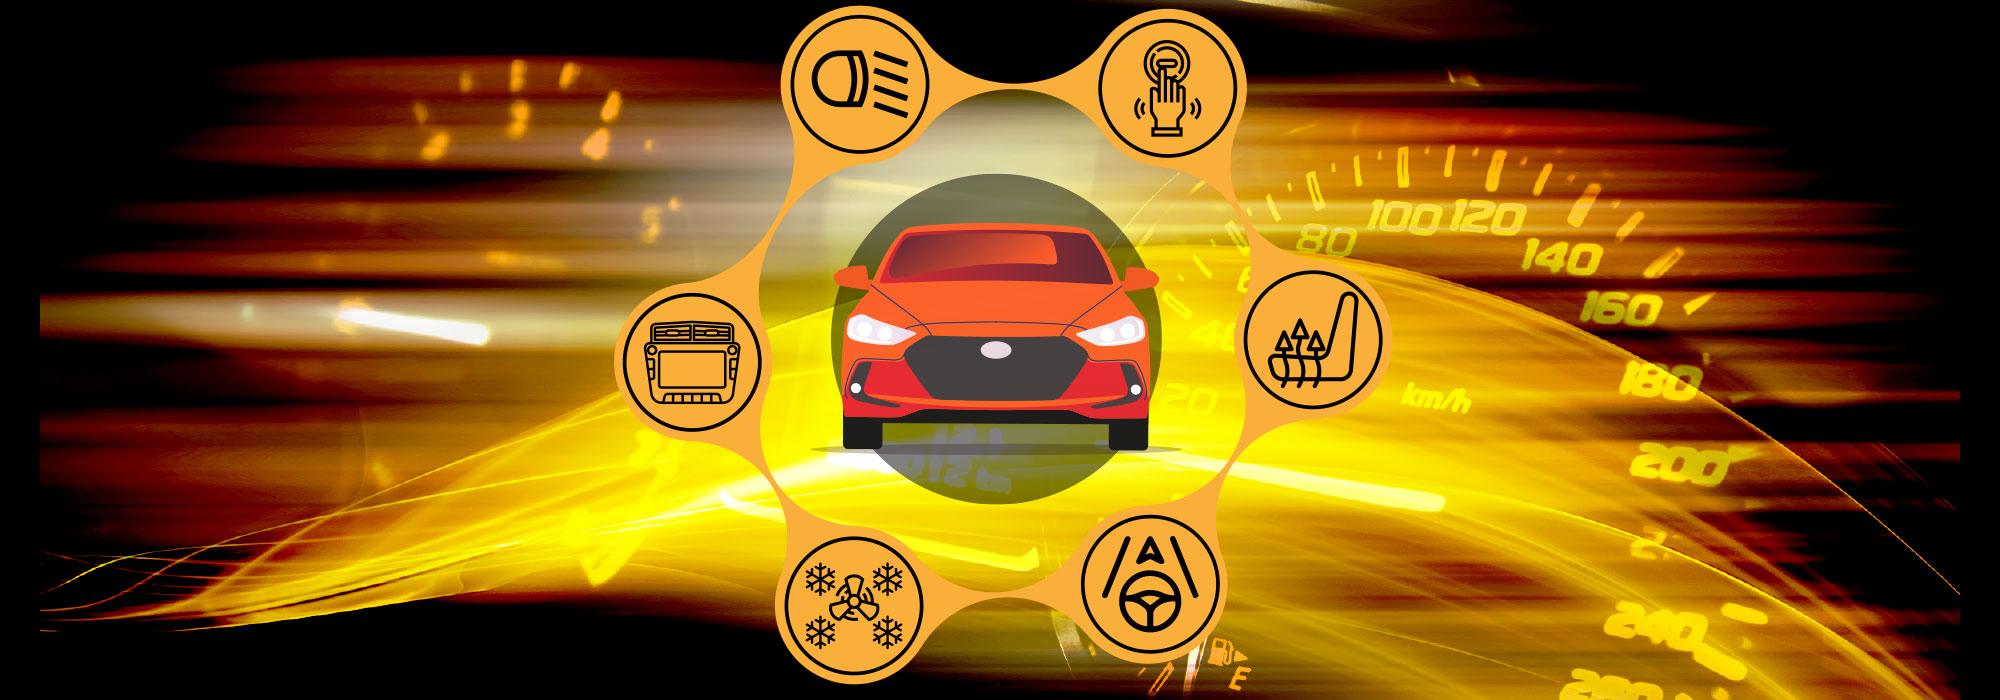 modern-car-battery.jpg